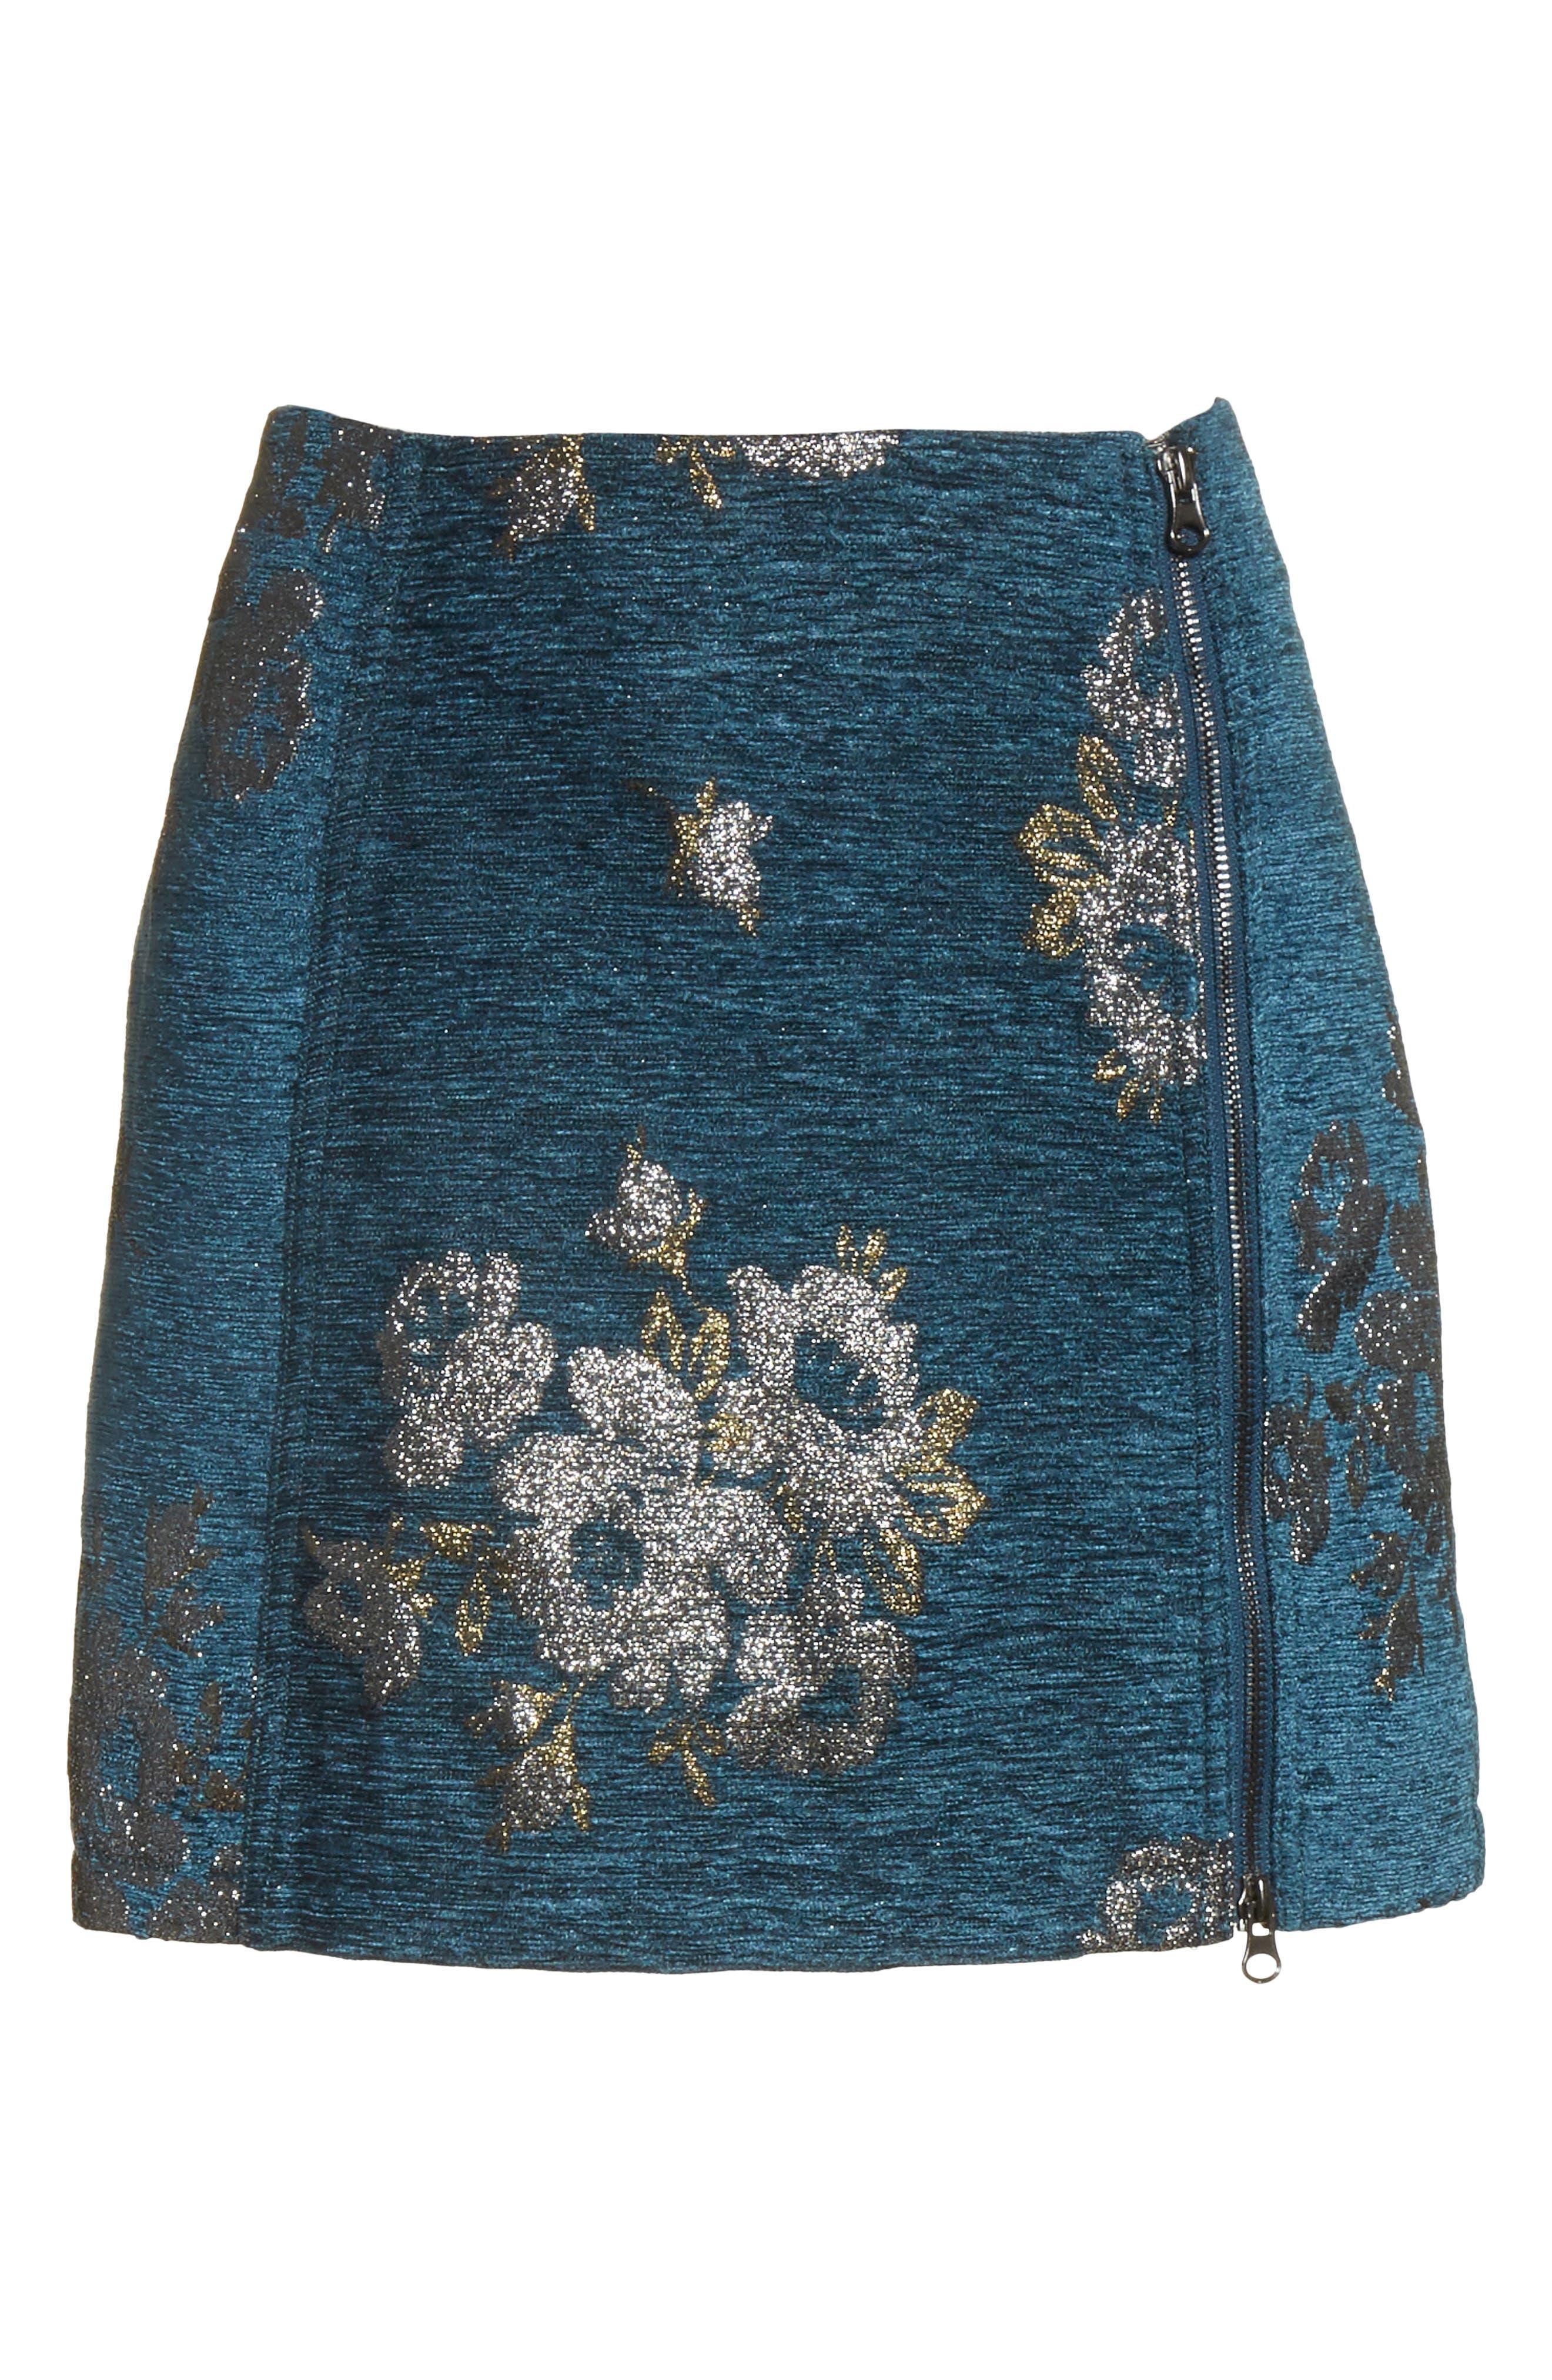 Movin' On Miniskirt,                             Alternate thumbnail 6, color,                             Dark Turquoise